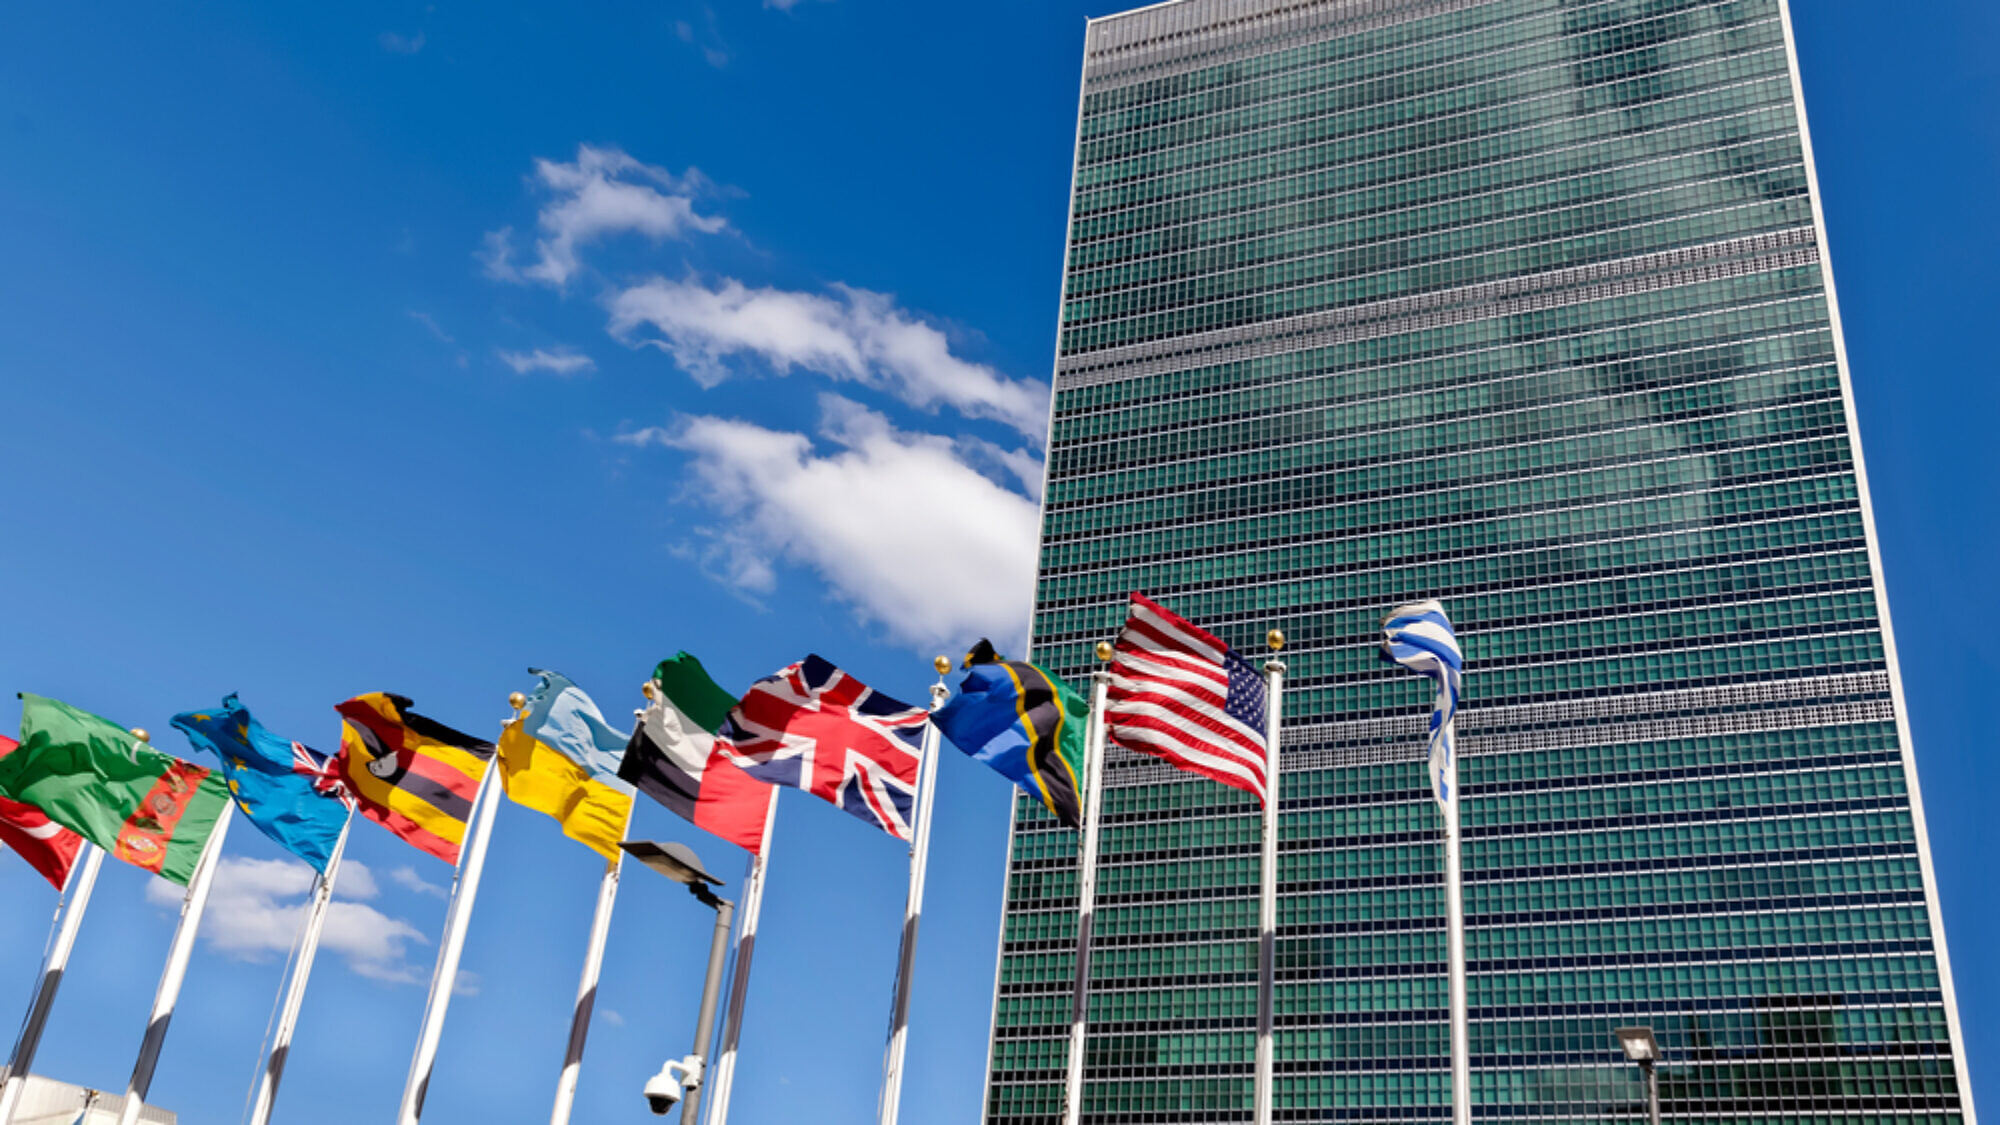 United Nations headquarters in New York City, USA. Credit: blurAZ/Shutterstock.